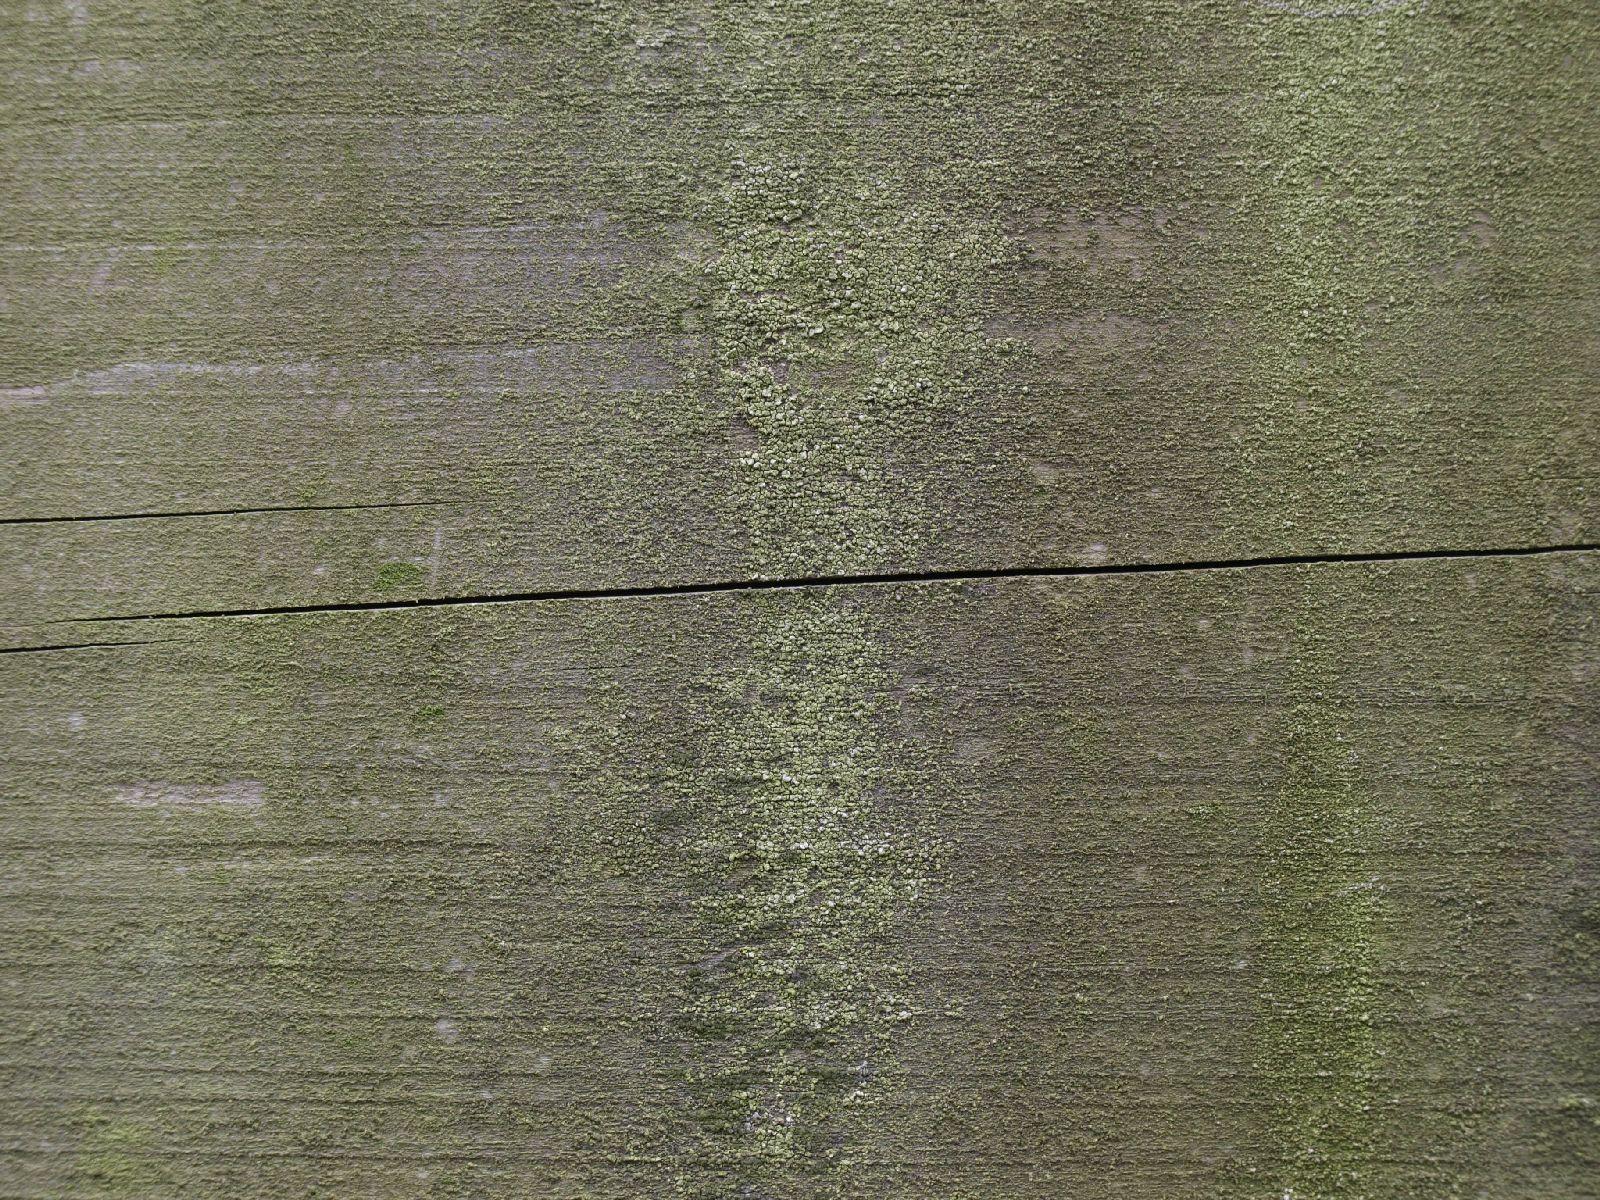 Wood_Texture_A_P2010343